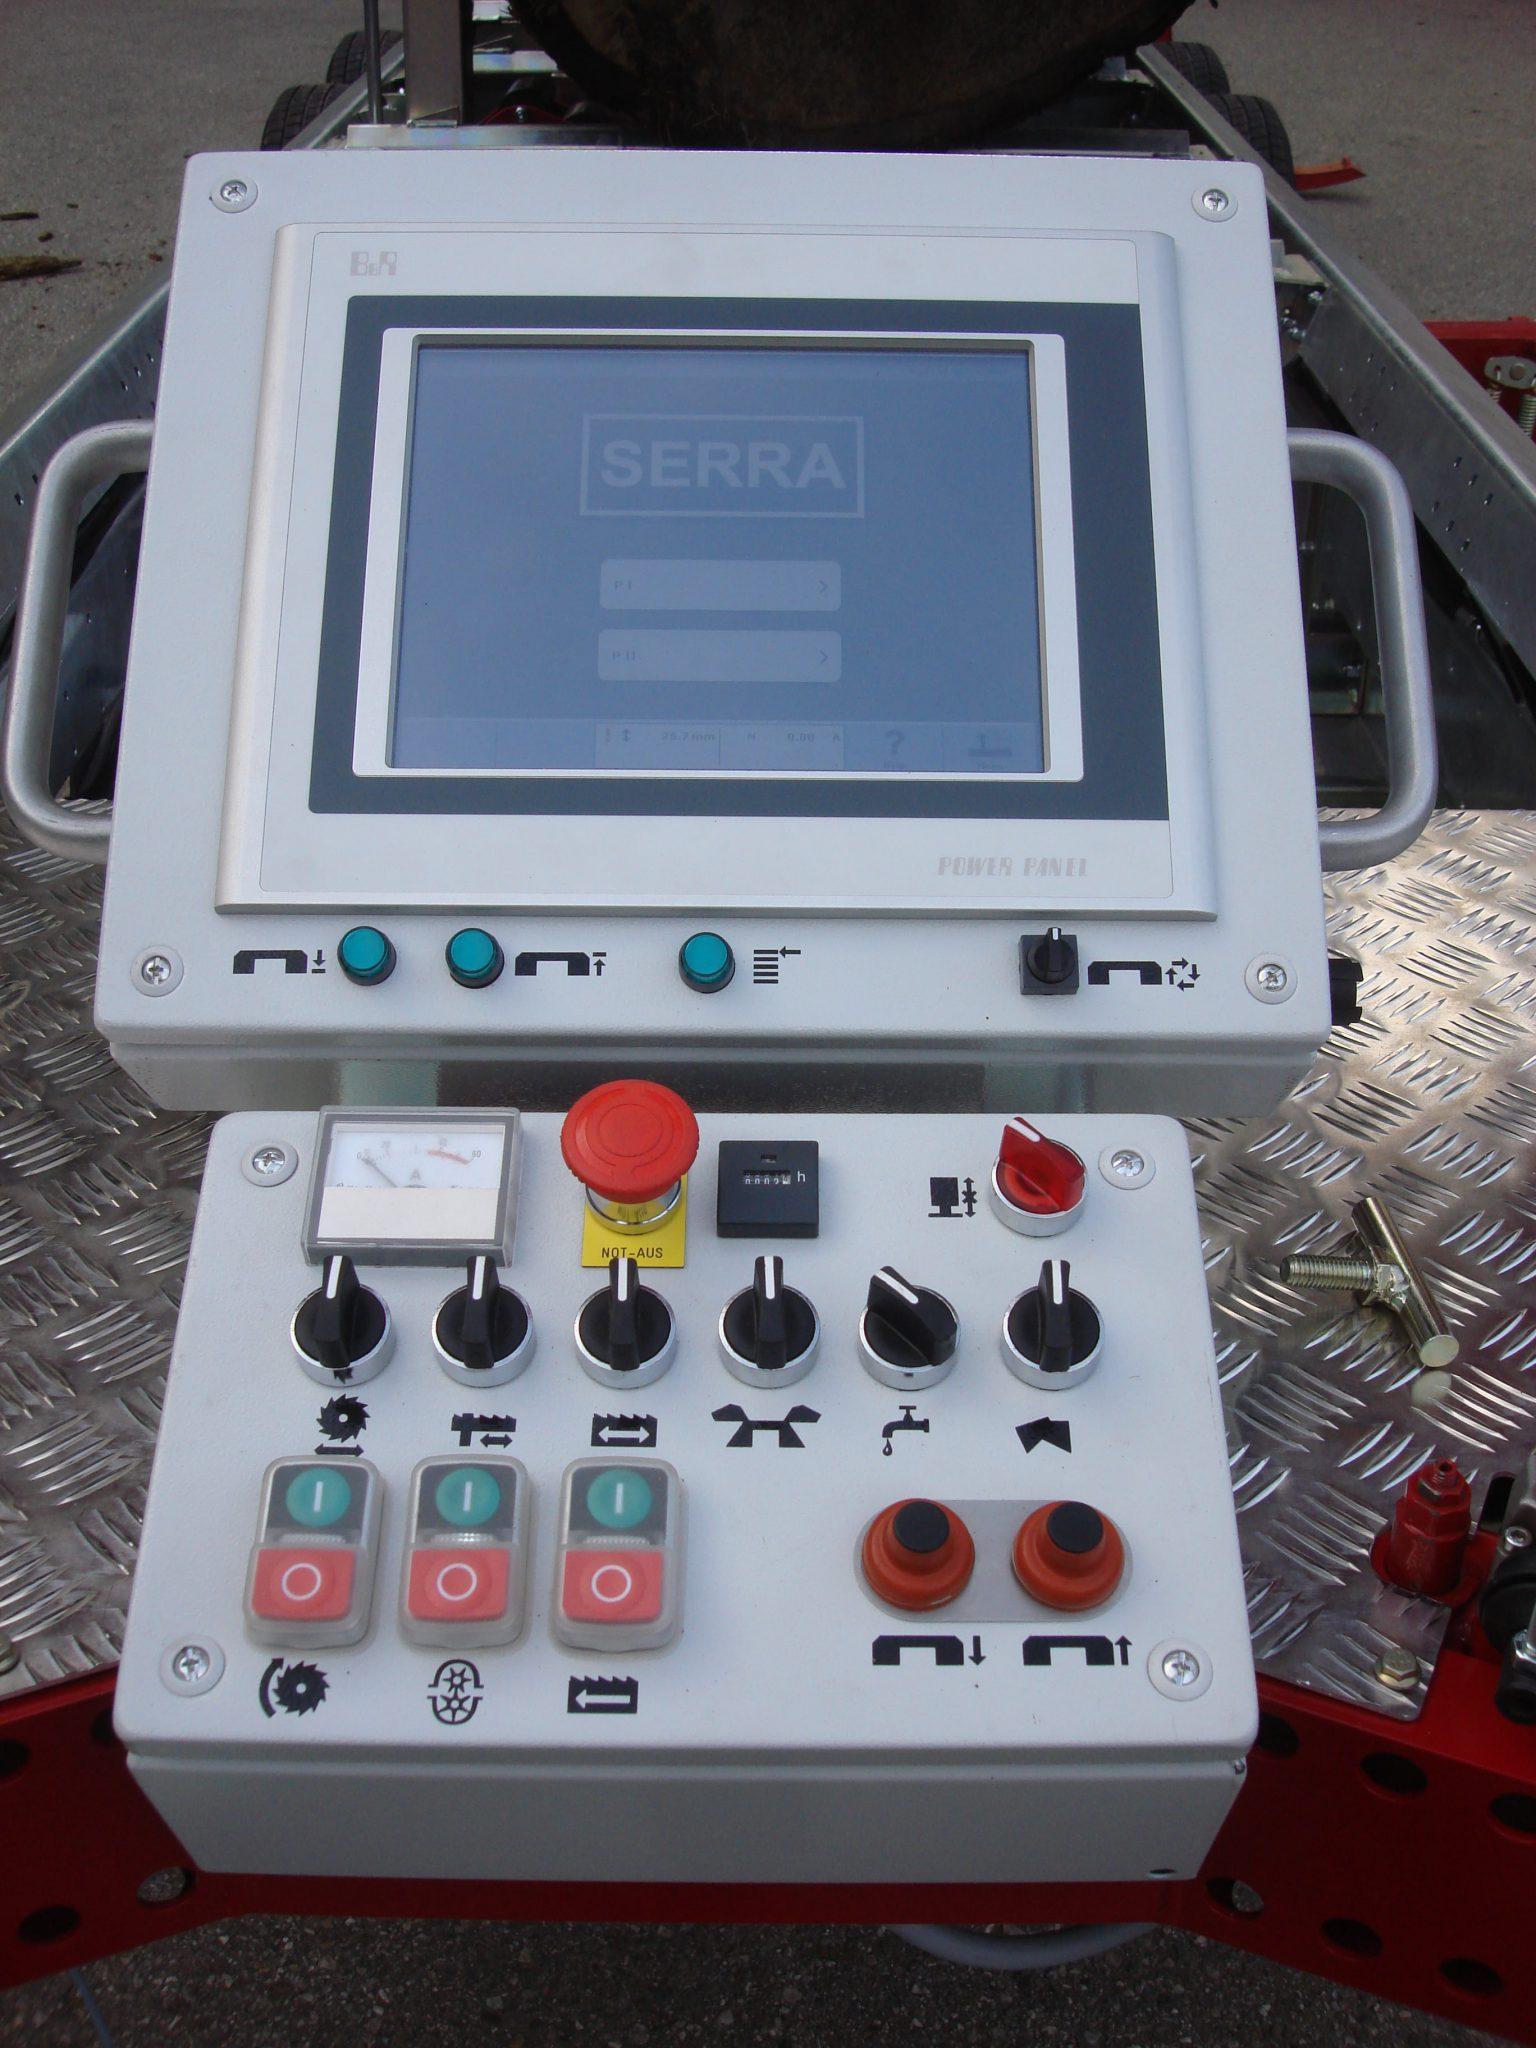 SERRA-POSI-Comfort Computerized controls